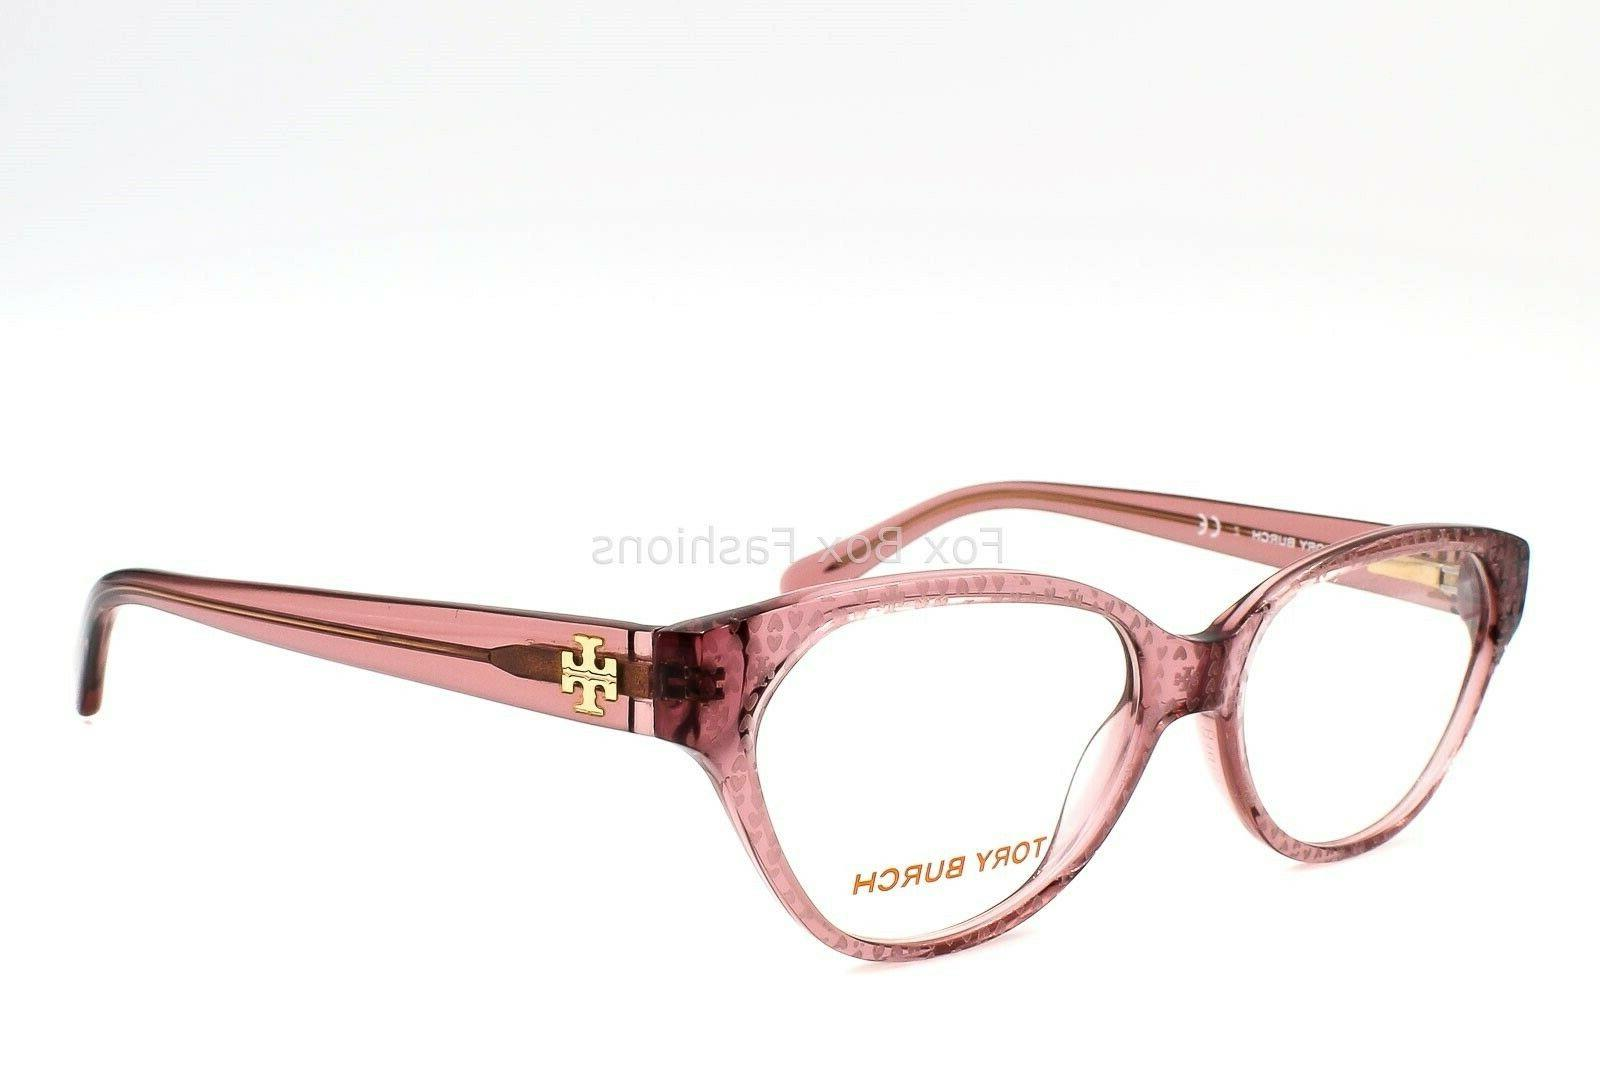 TORY BURCH TY 2032 1104 Eyeglasses Frame Glasses Rose Pink L